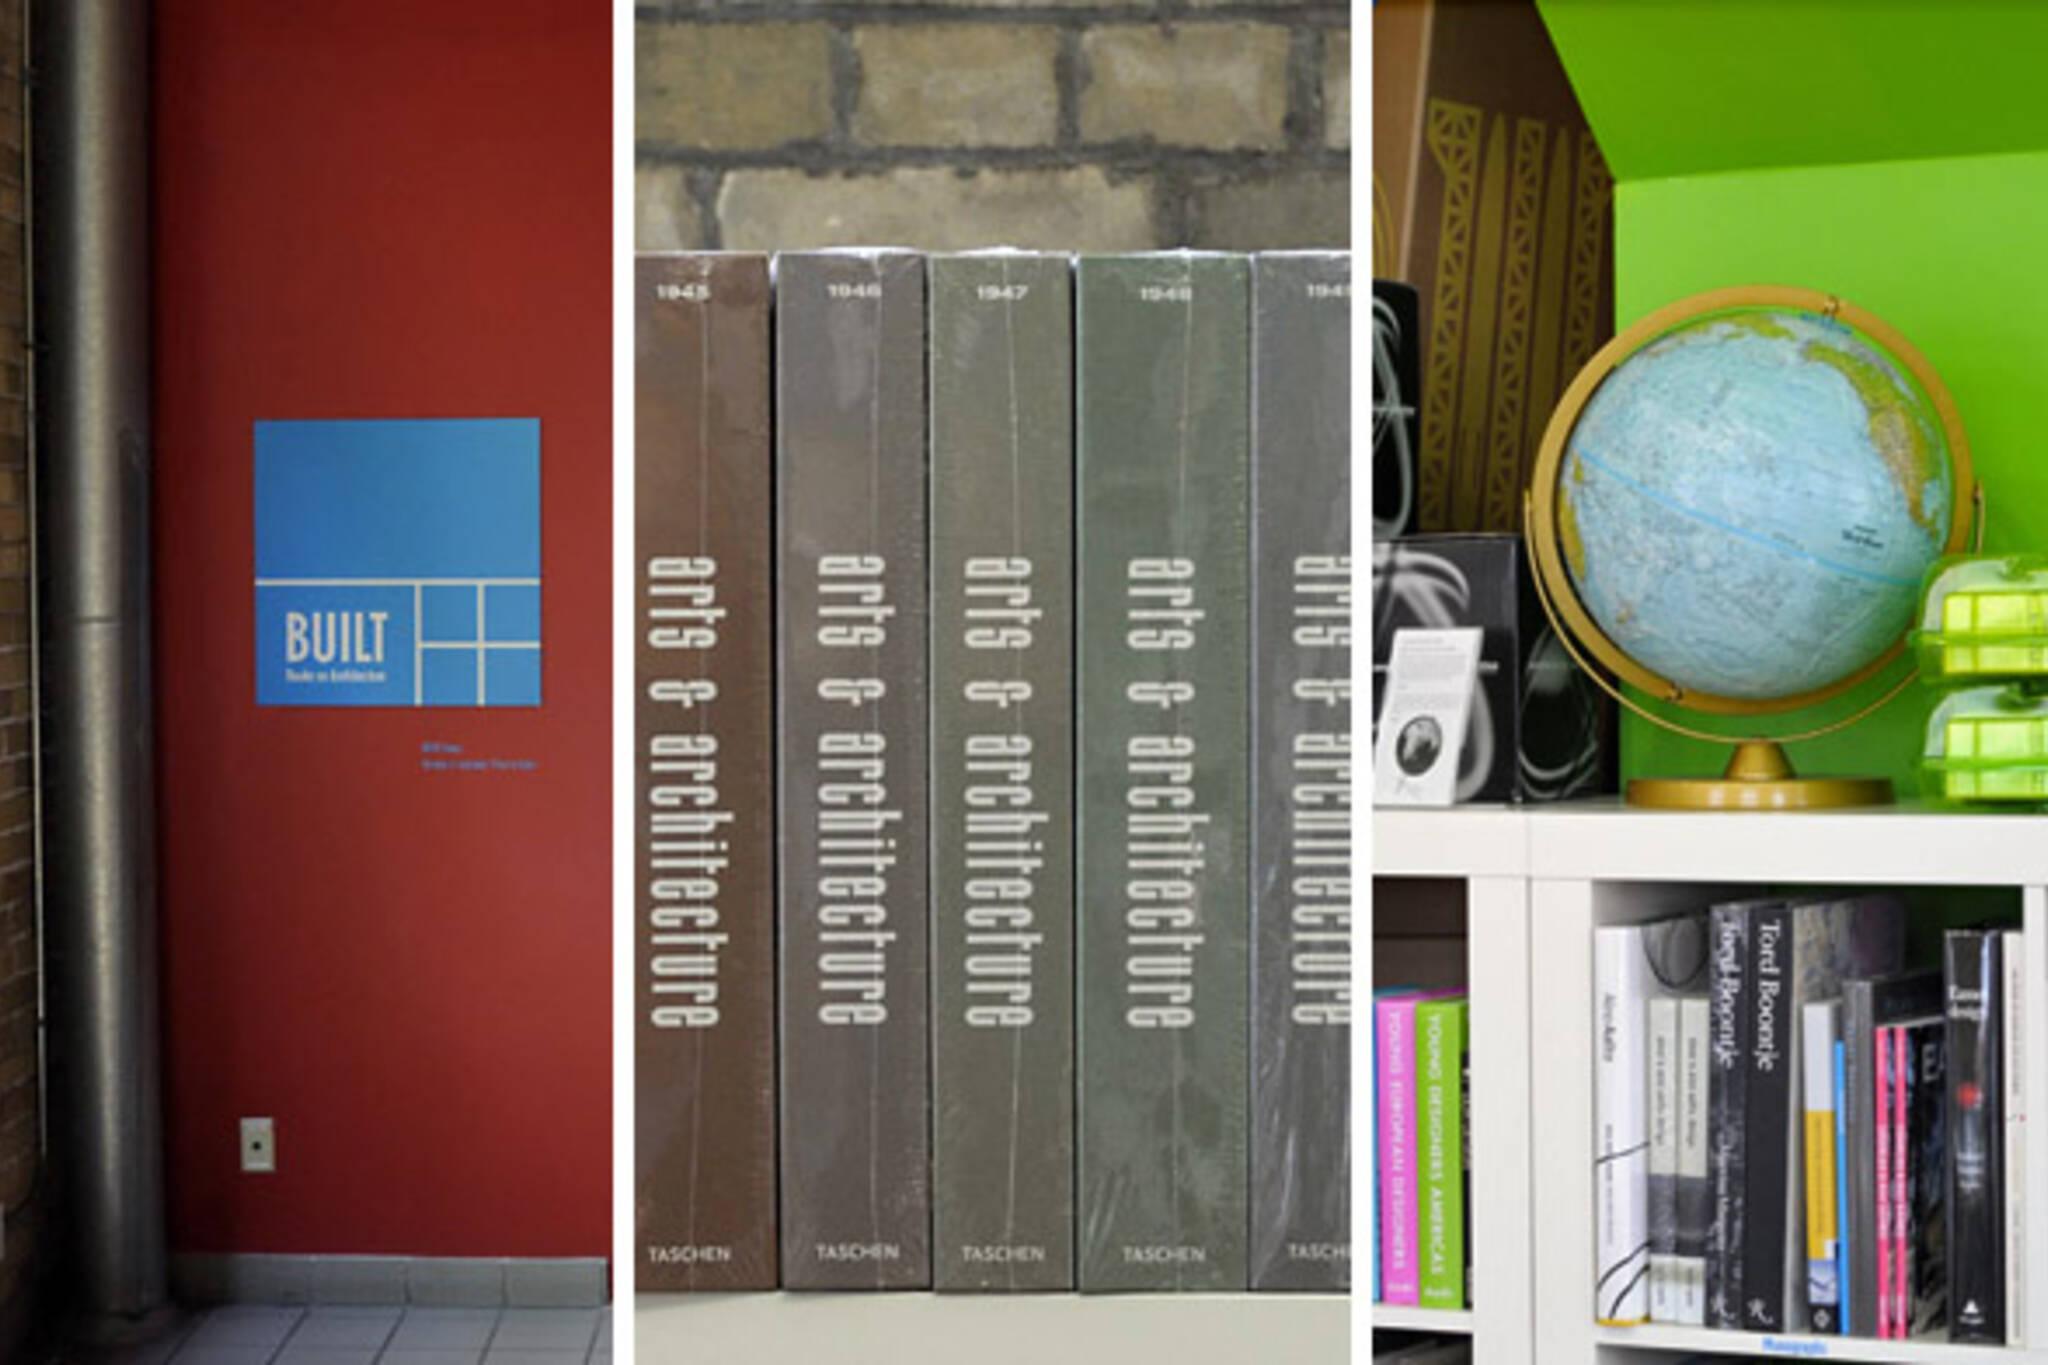 built bookstore toronto